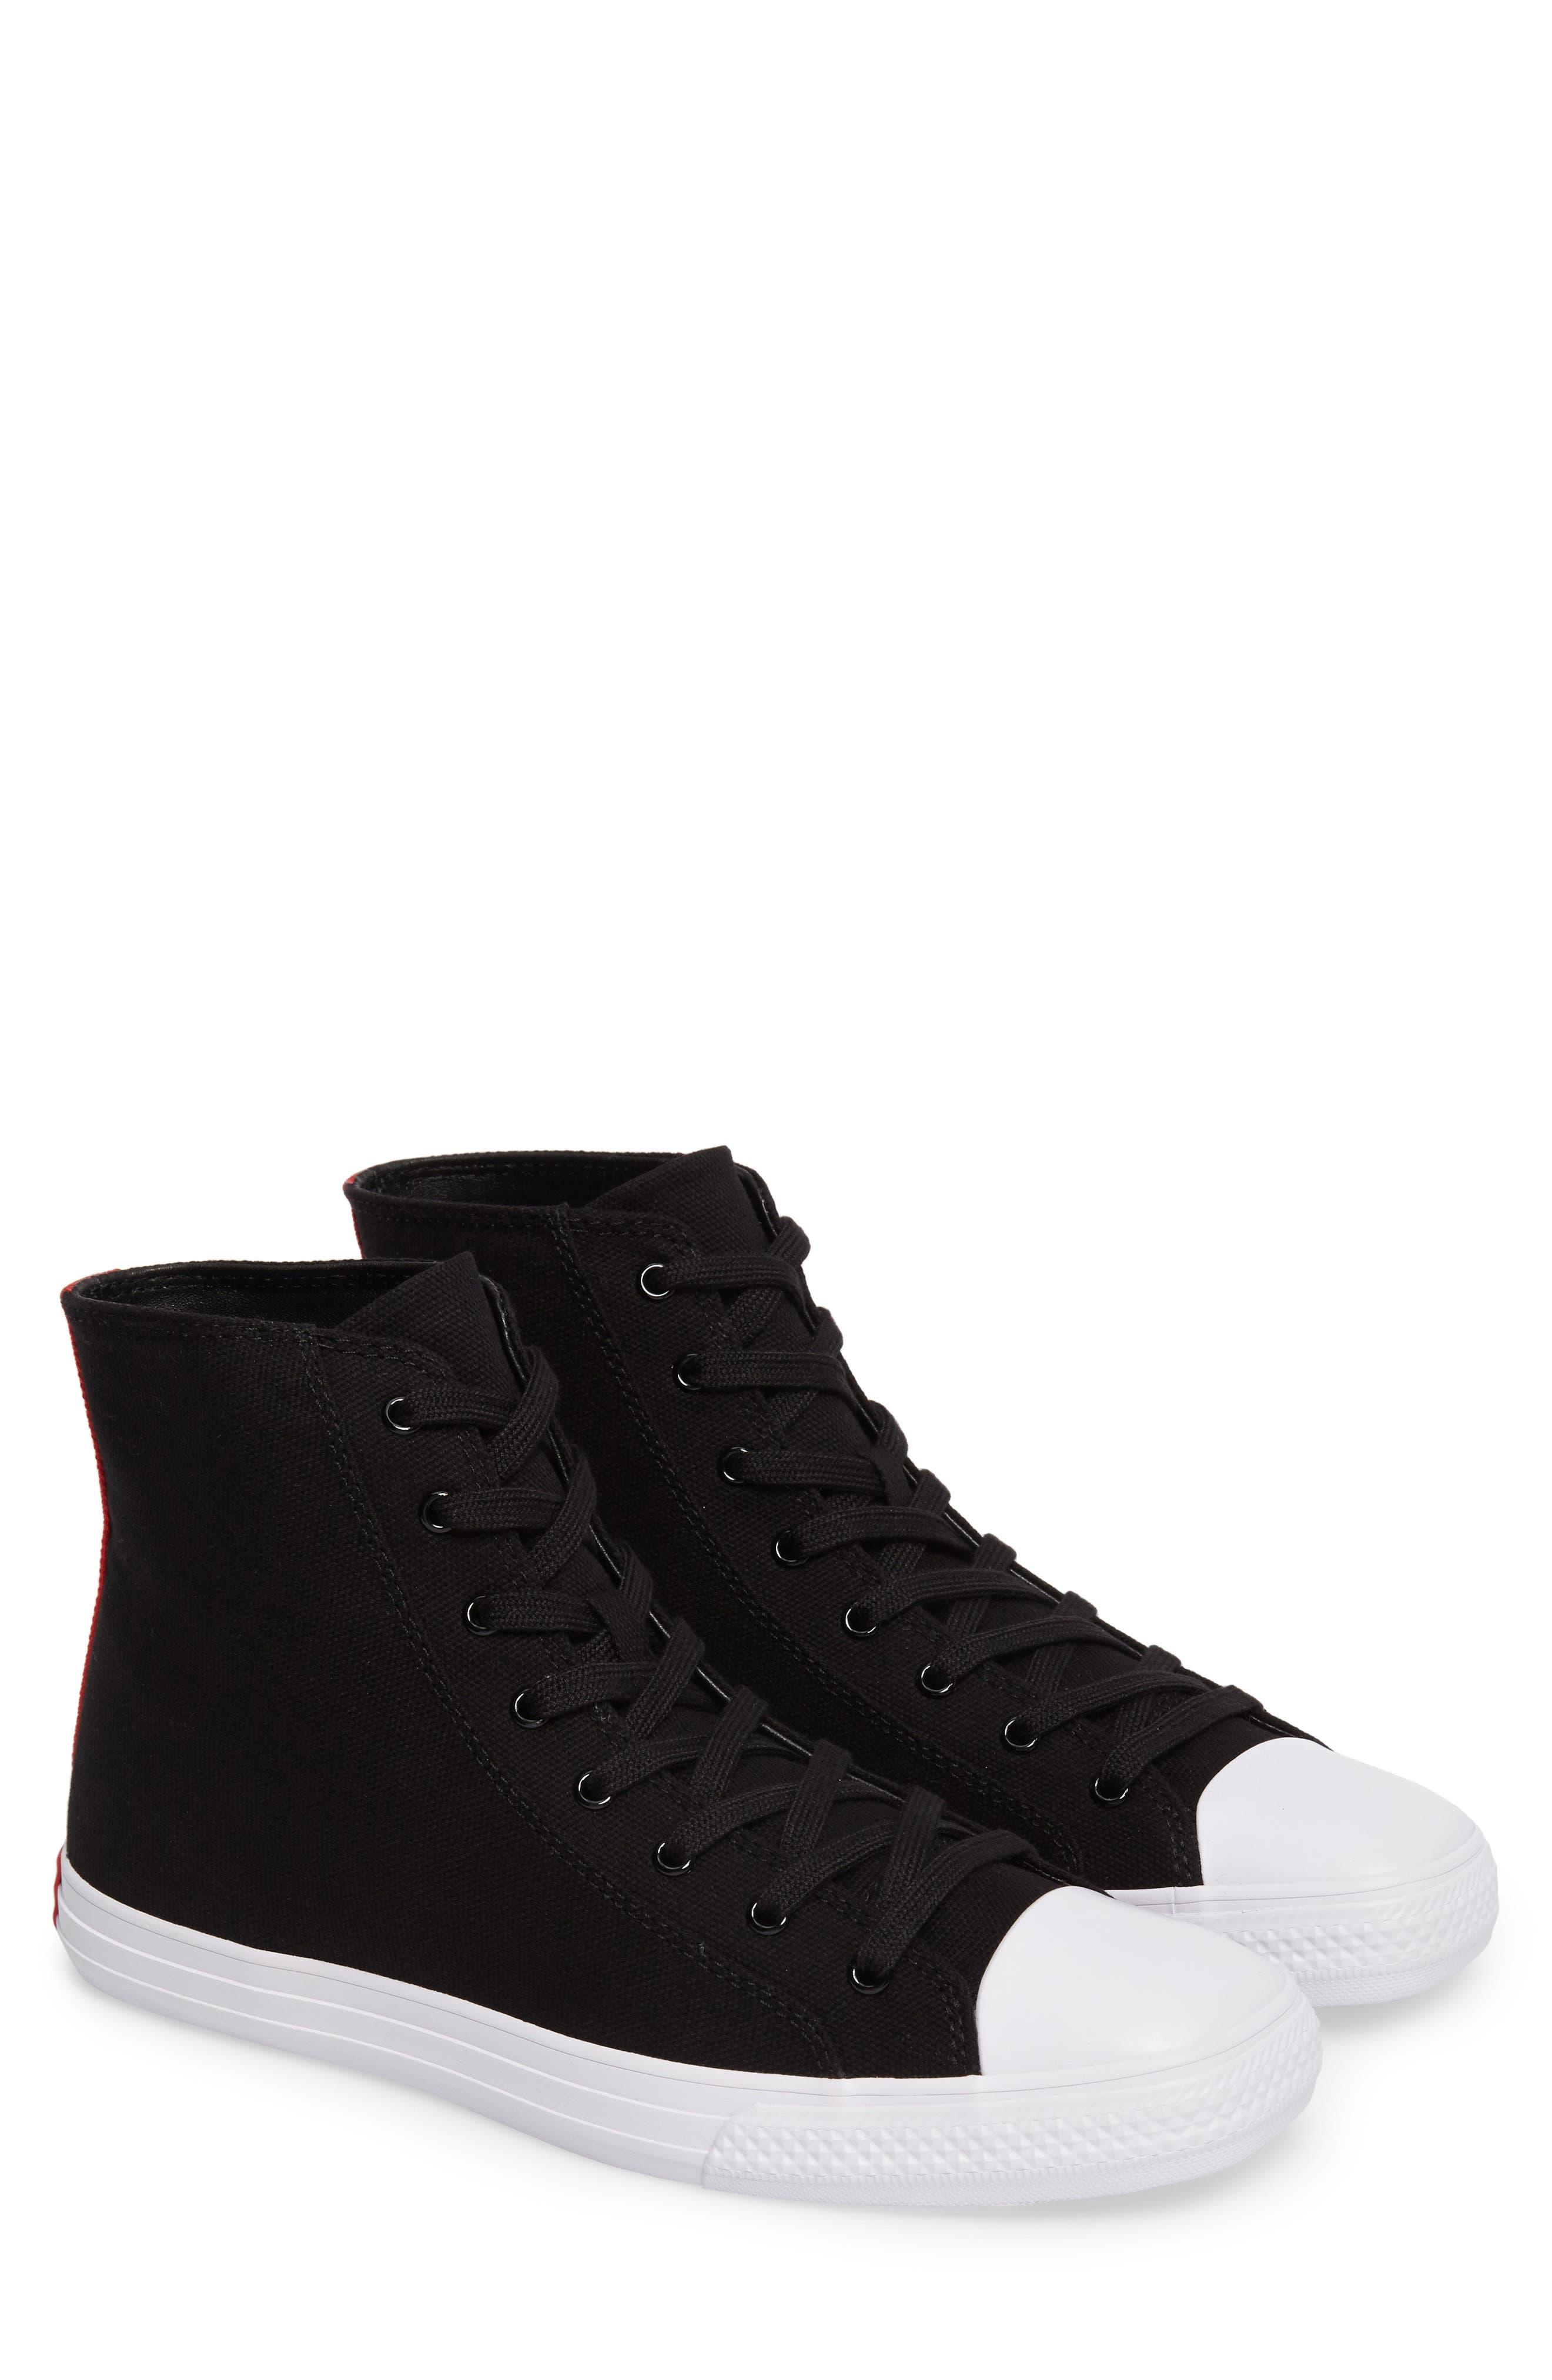 Constantine Sneaker,                             Main thumbnail 1, color,                             001